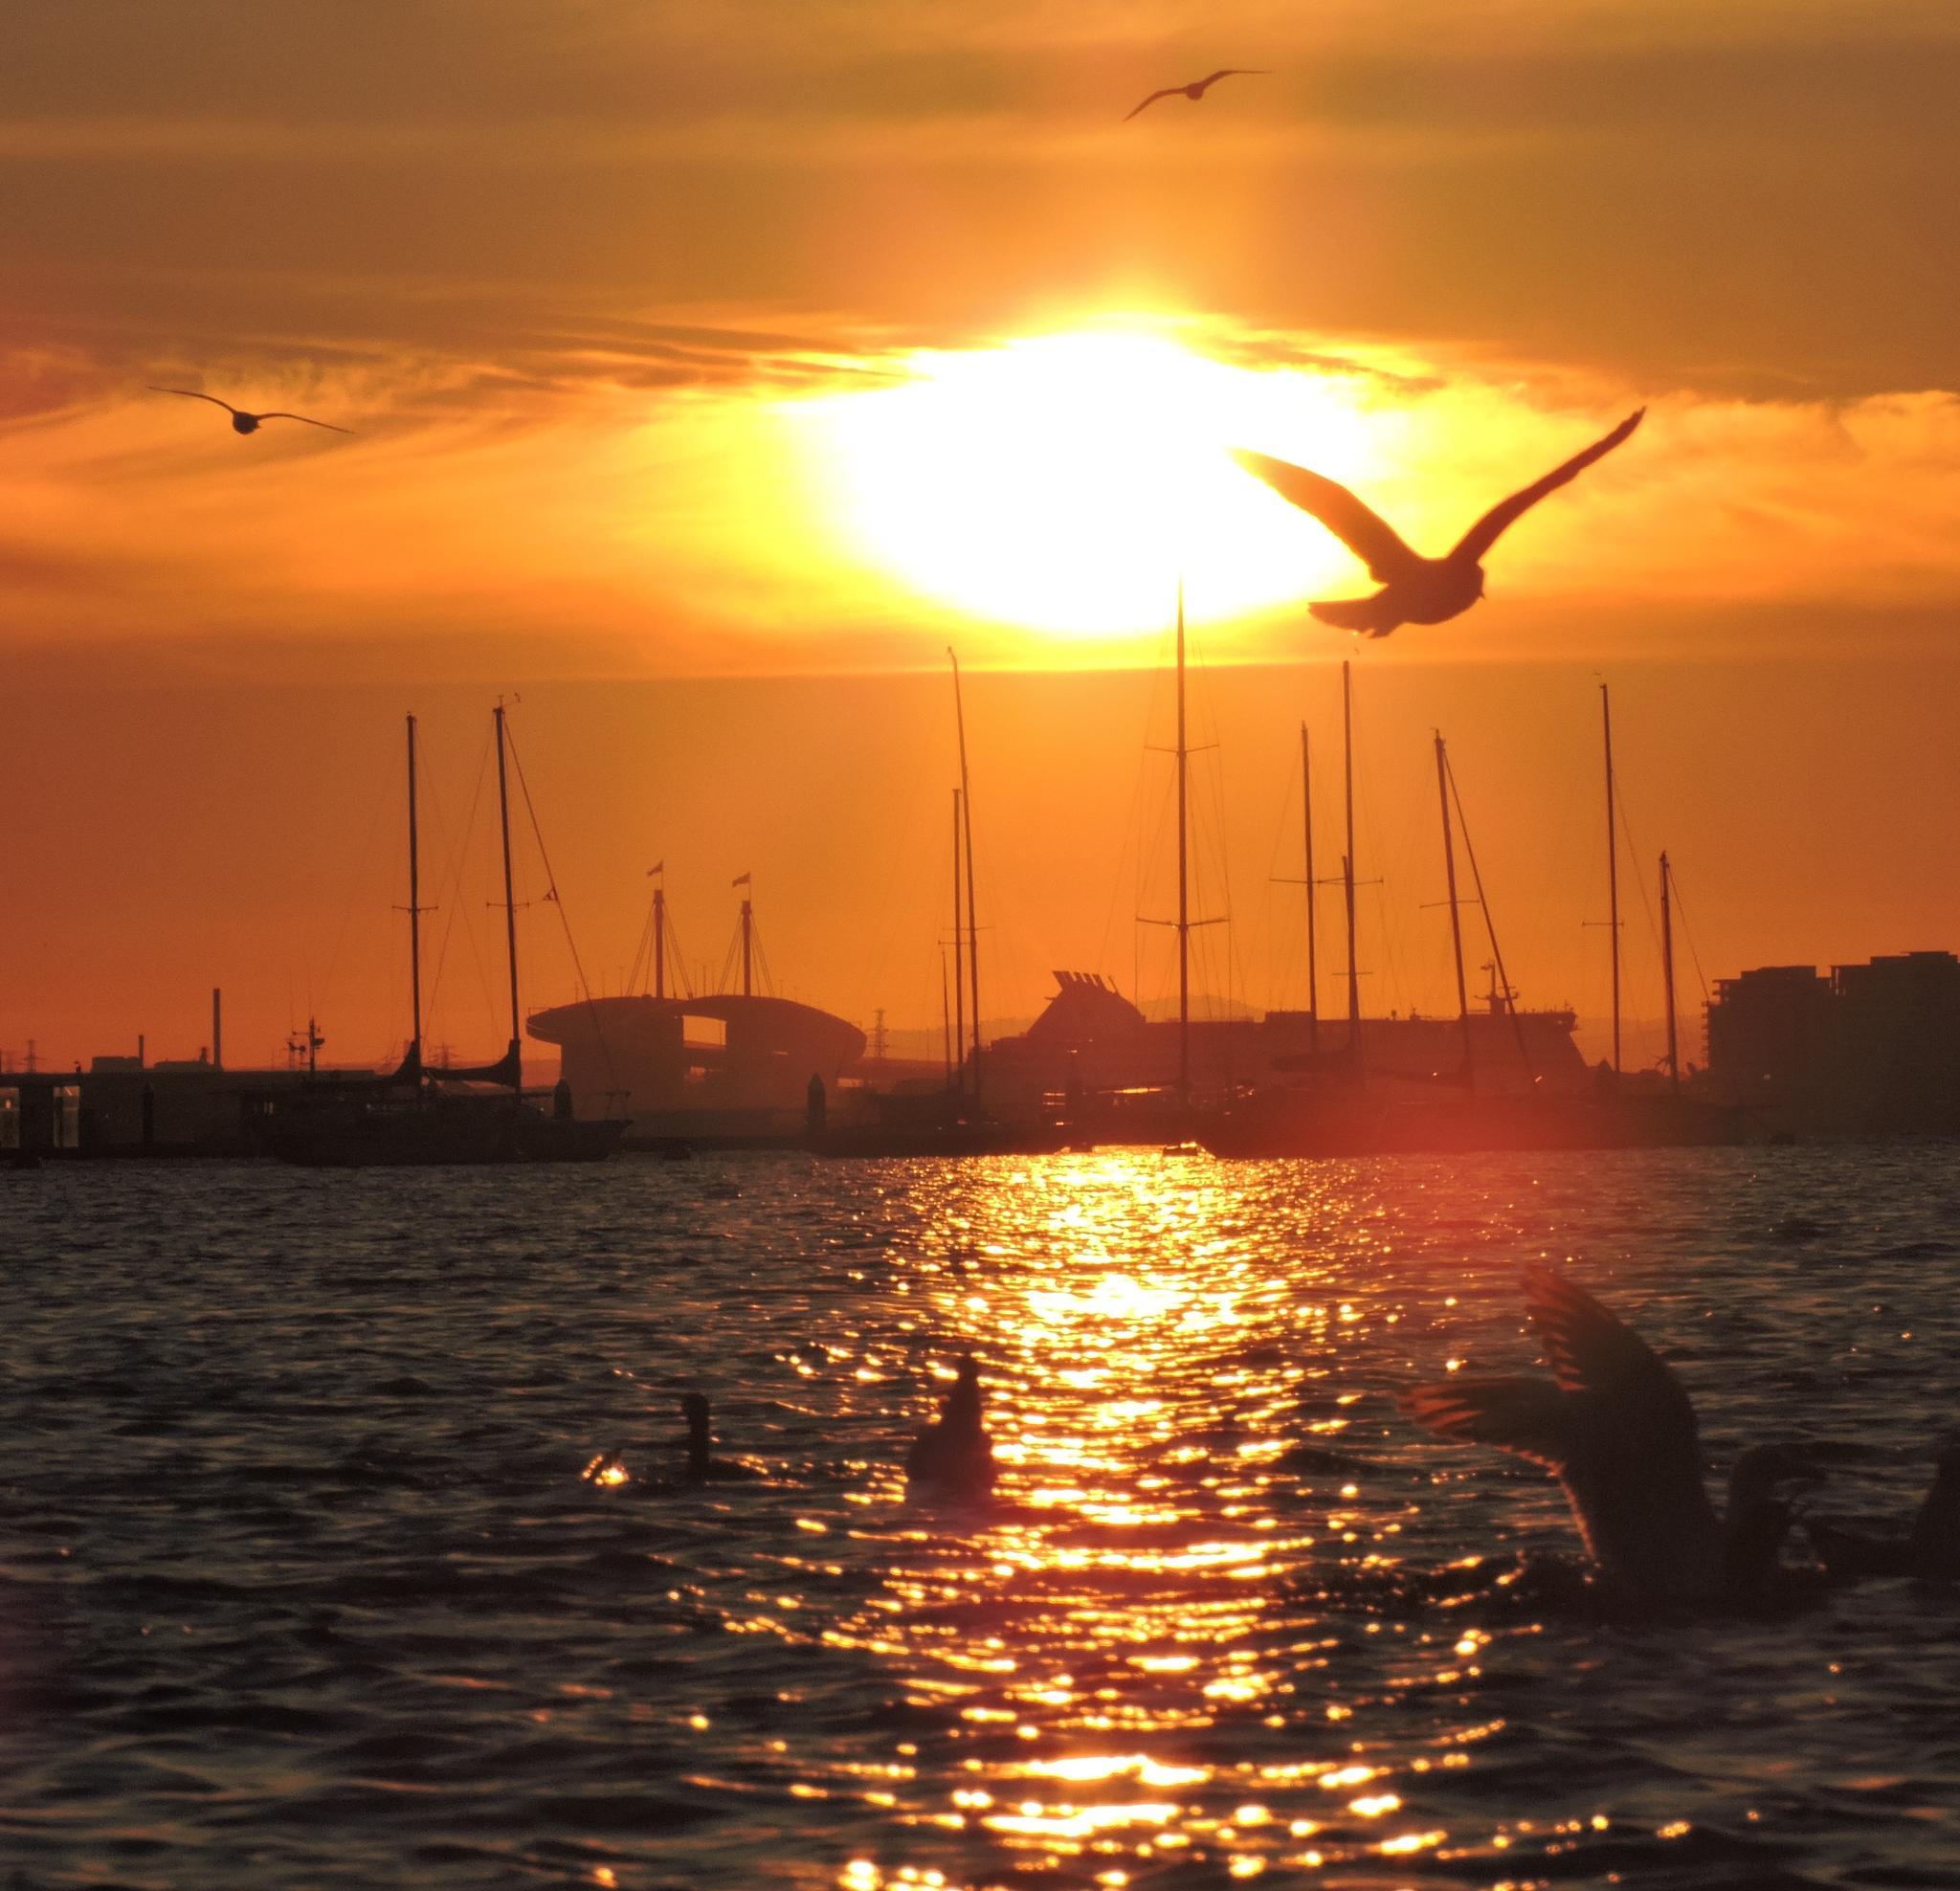 Sunset St Kilda Pier by RachW